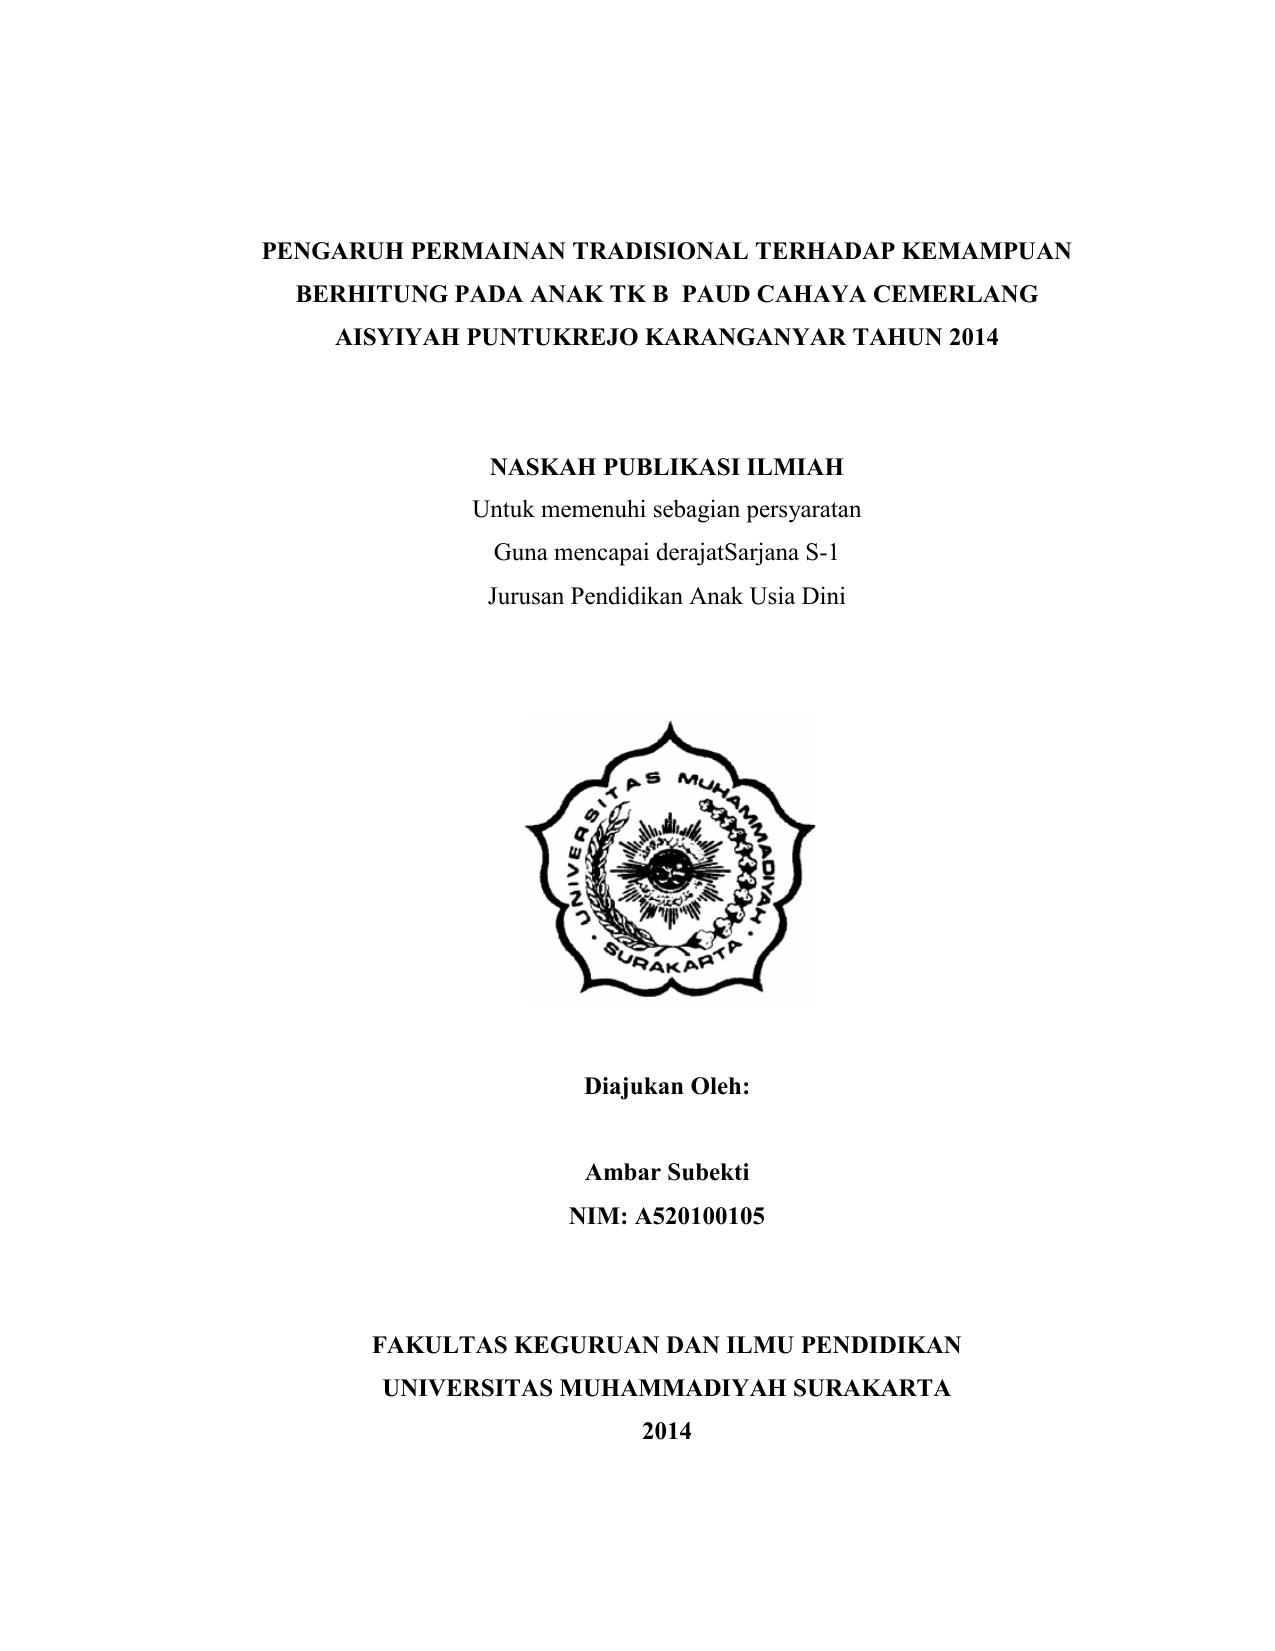 PENGARUH PERMAINAN TRADISIONAL TERHADAP KEMAMPUAN BERHITUNG PADA ANAK TK B PAUD CAHAYA CEMERLANG AISYIYAH PUNTUKREJO KARANGANYAR TAHUN 2014 NASKAH PUBLIKASI